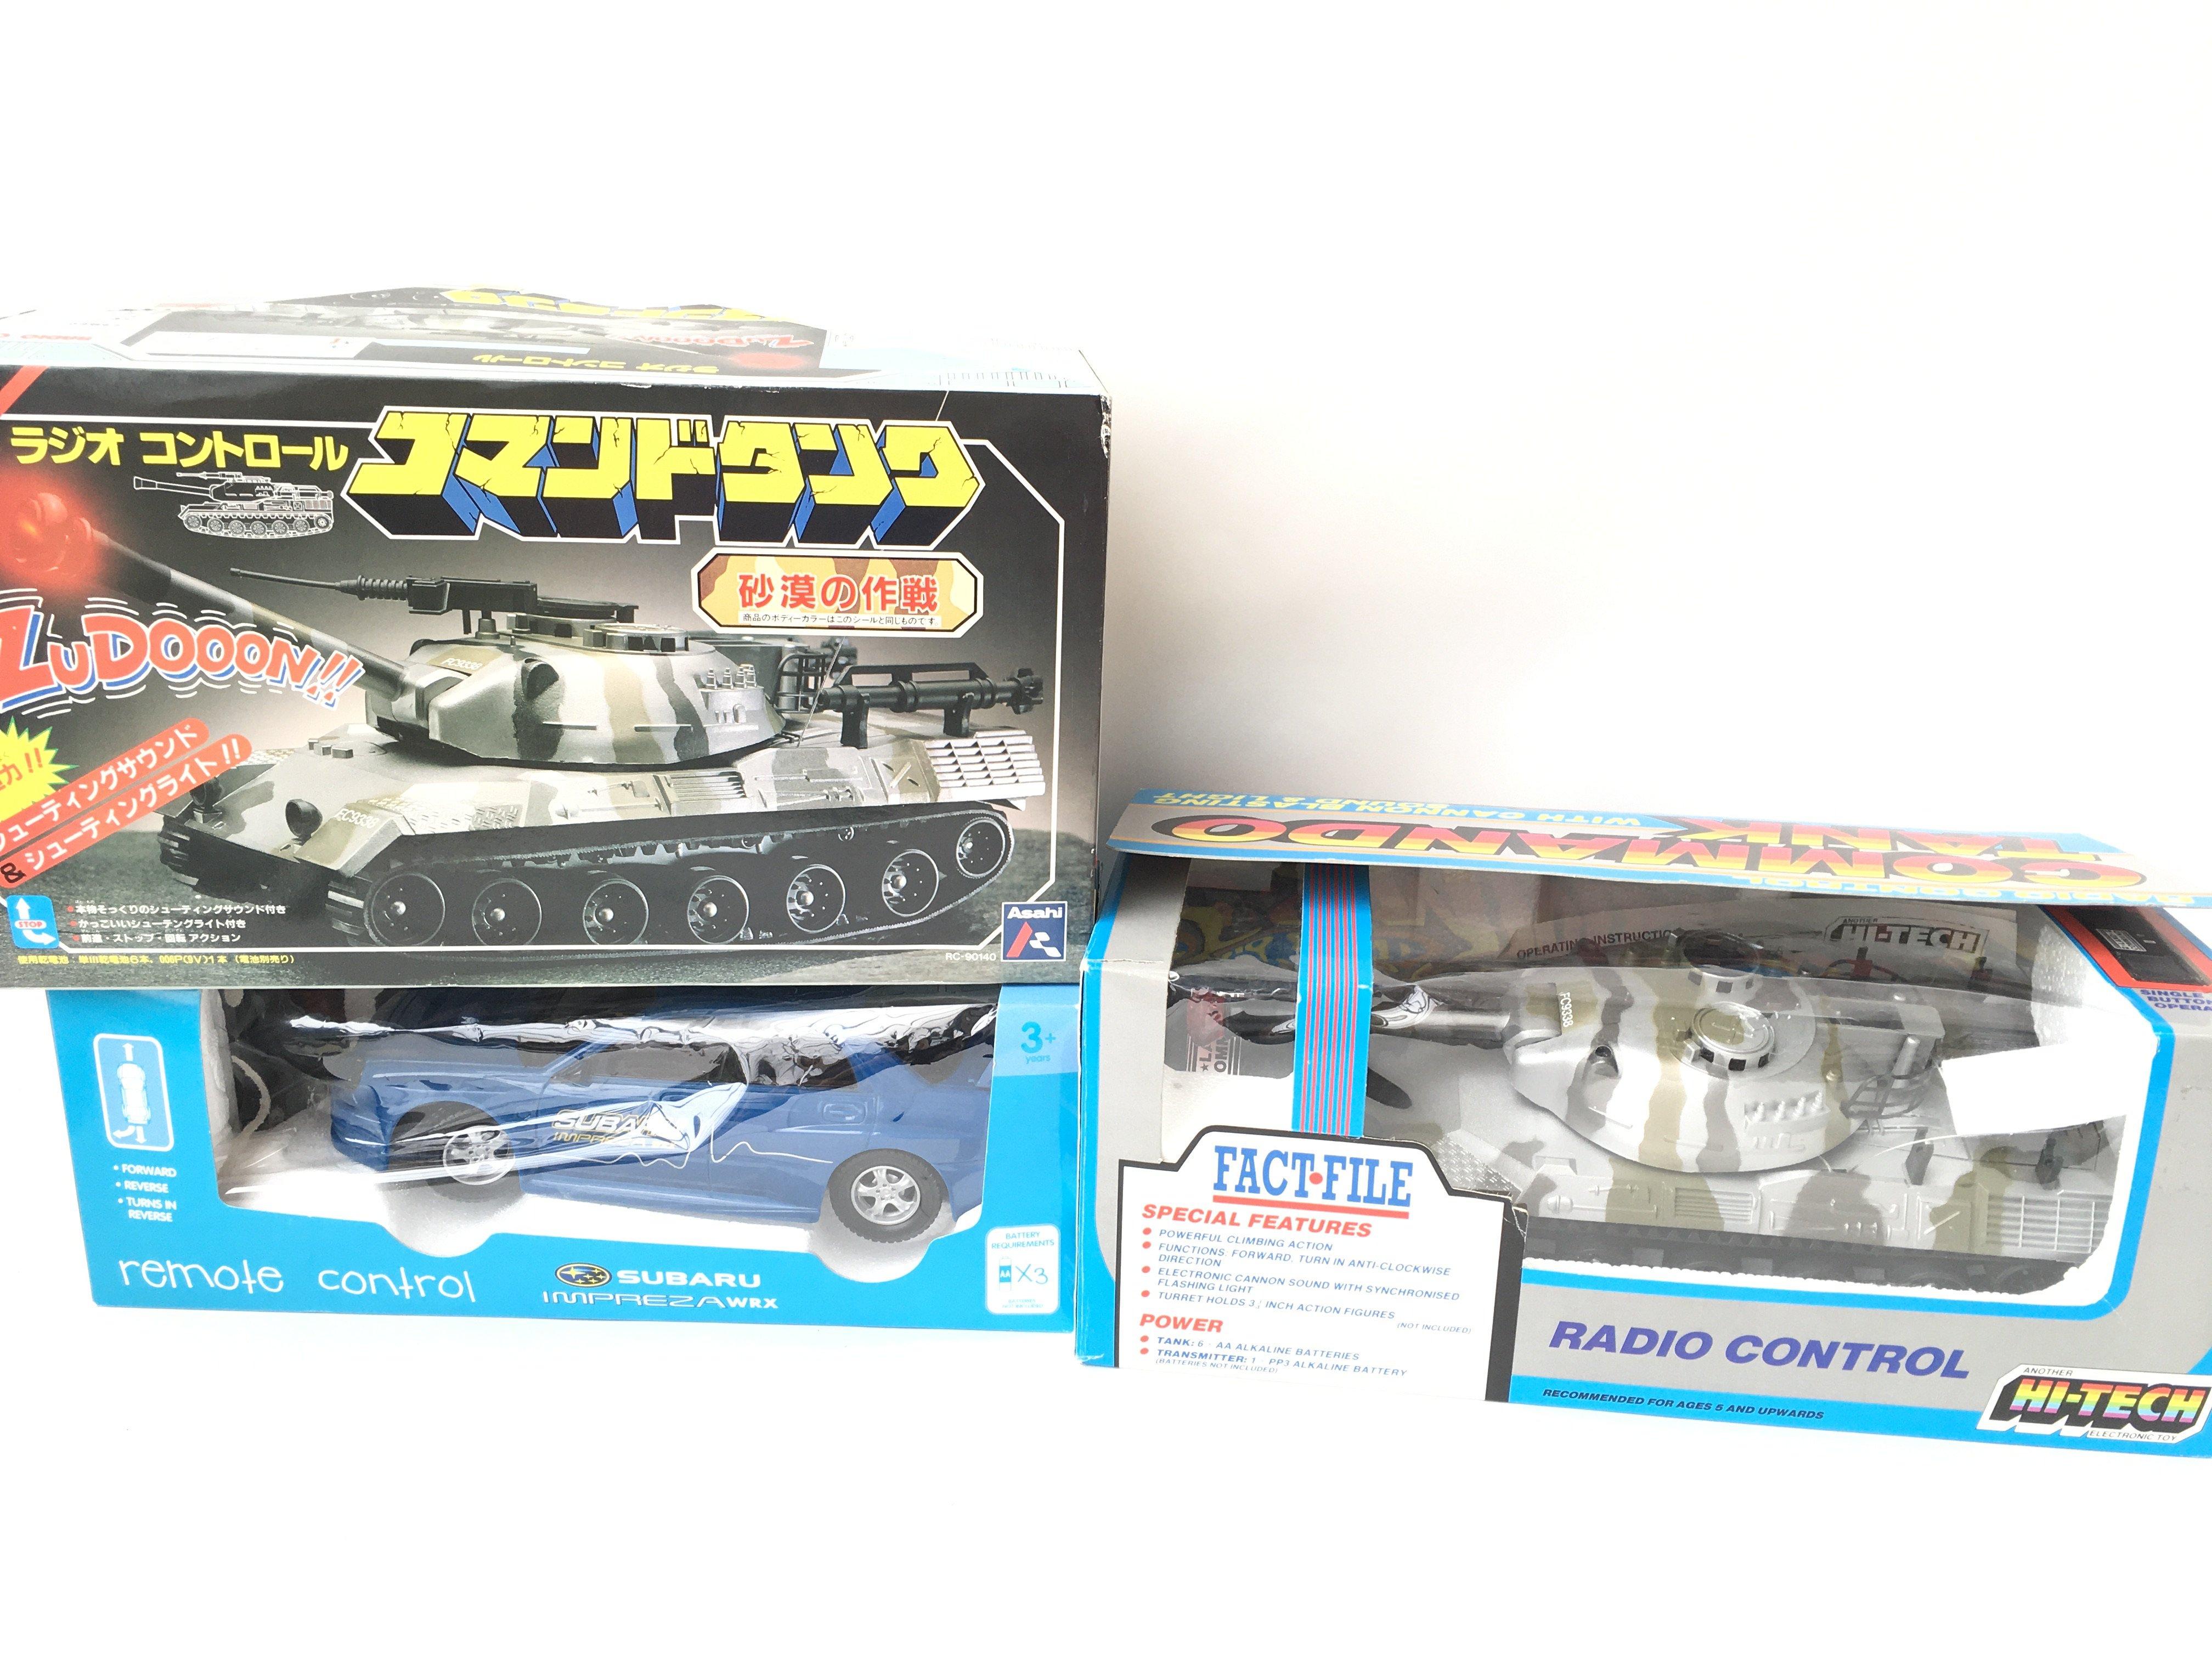 2 X Radio Controlled Command Tanks & A R/C Subaru